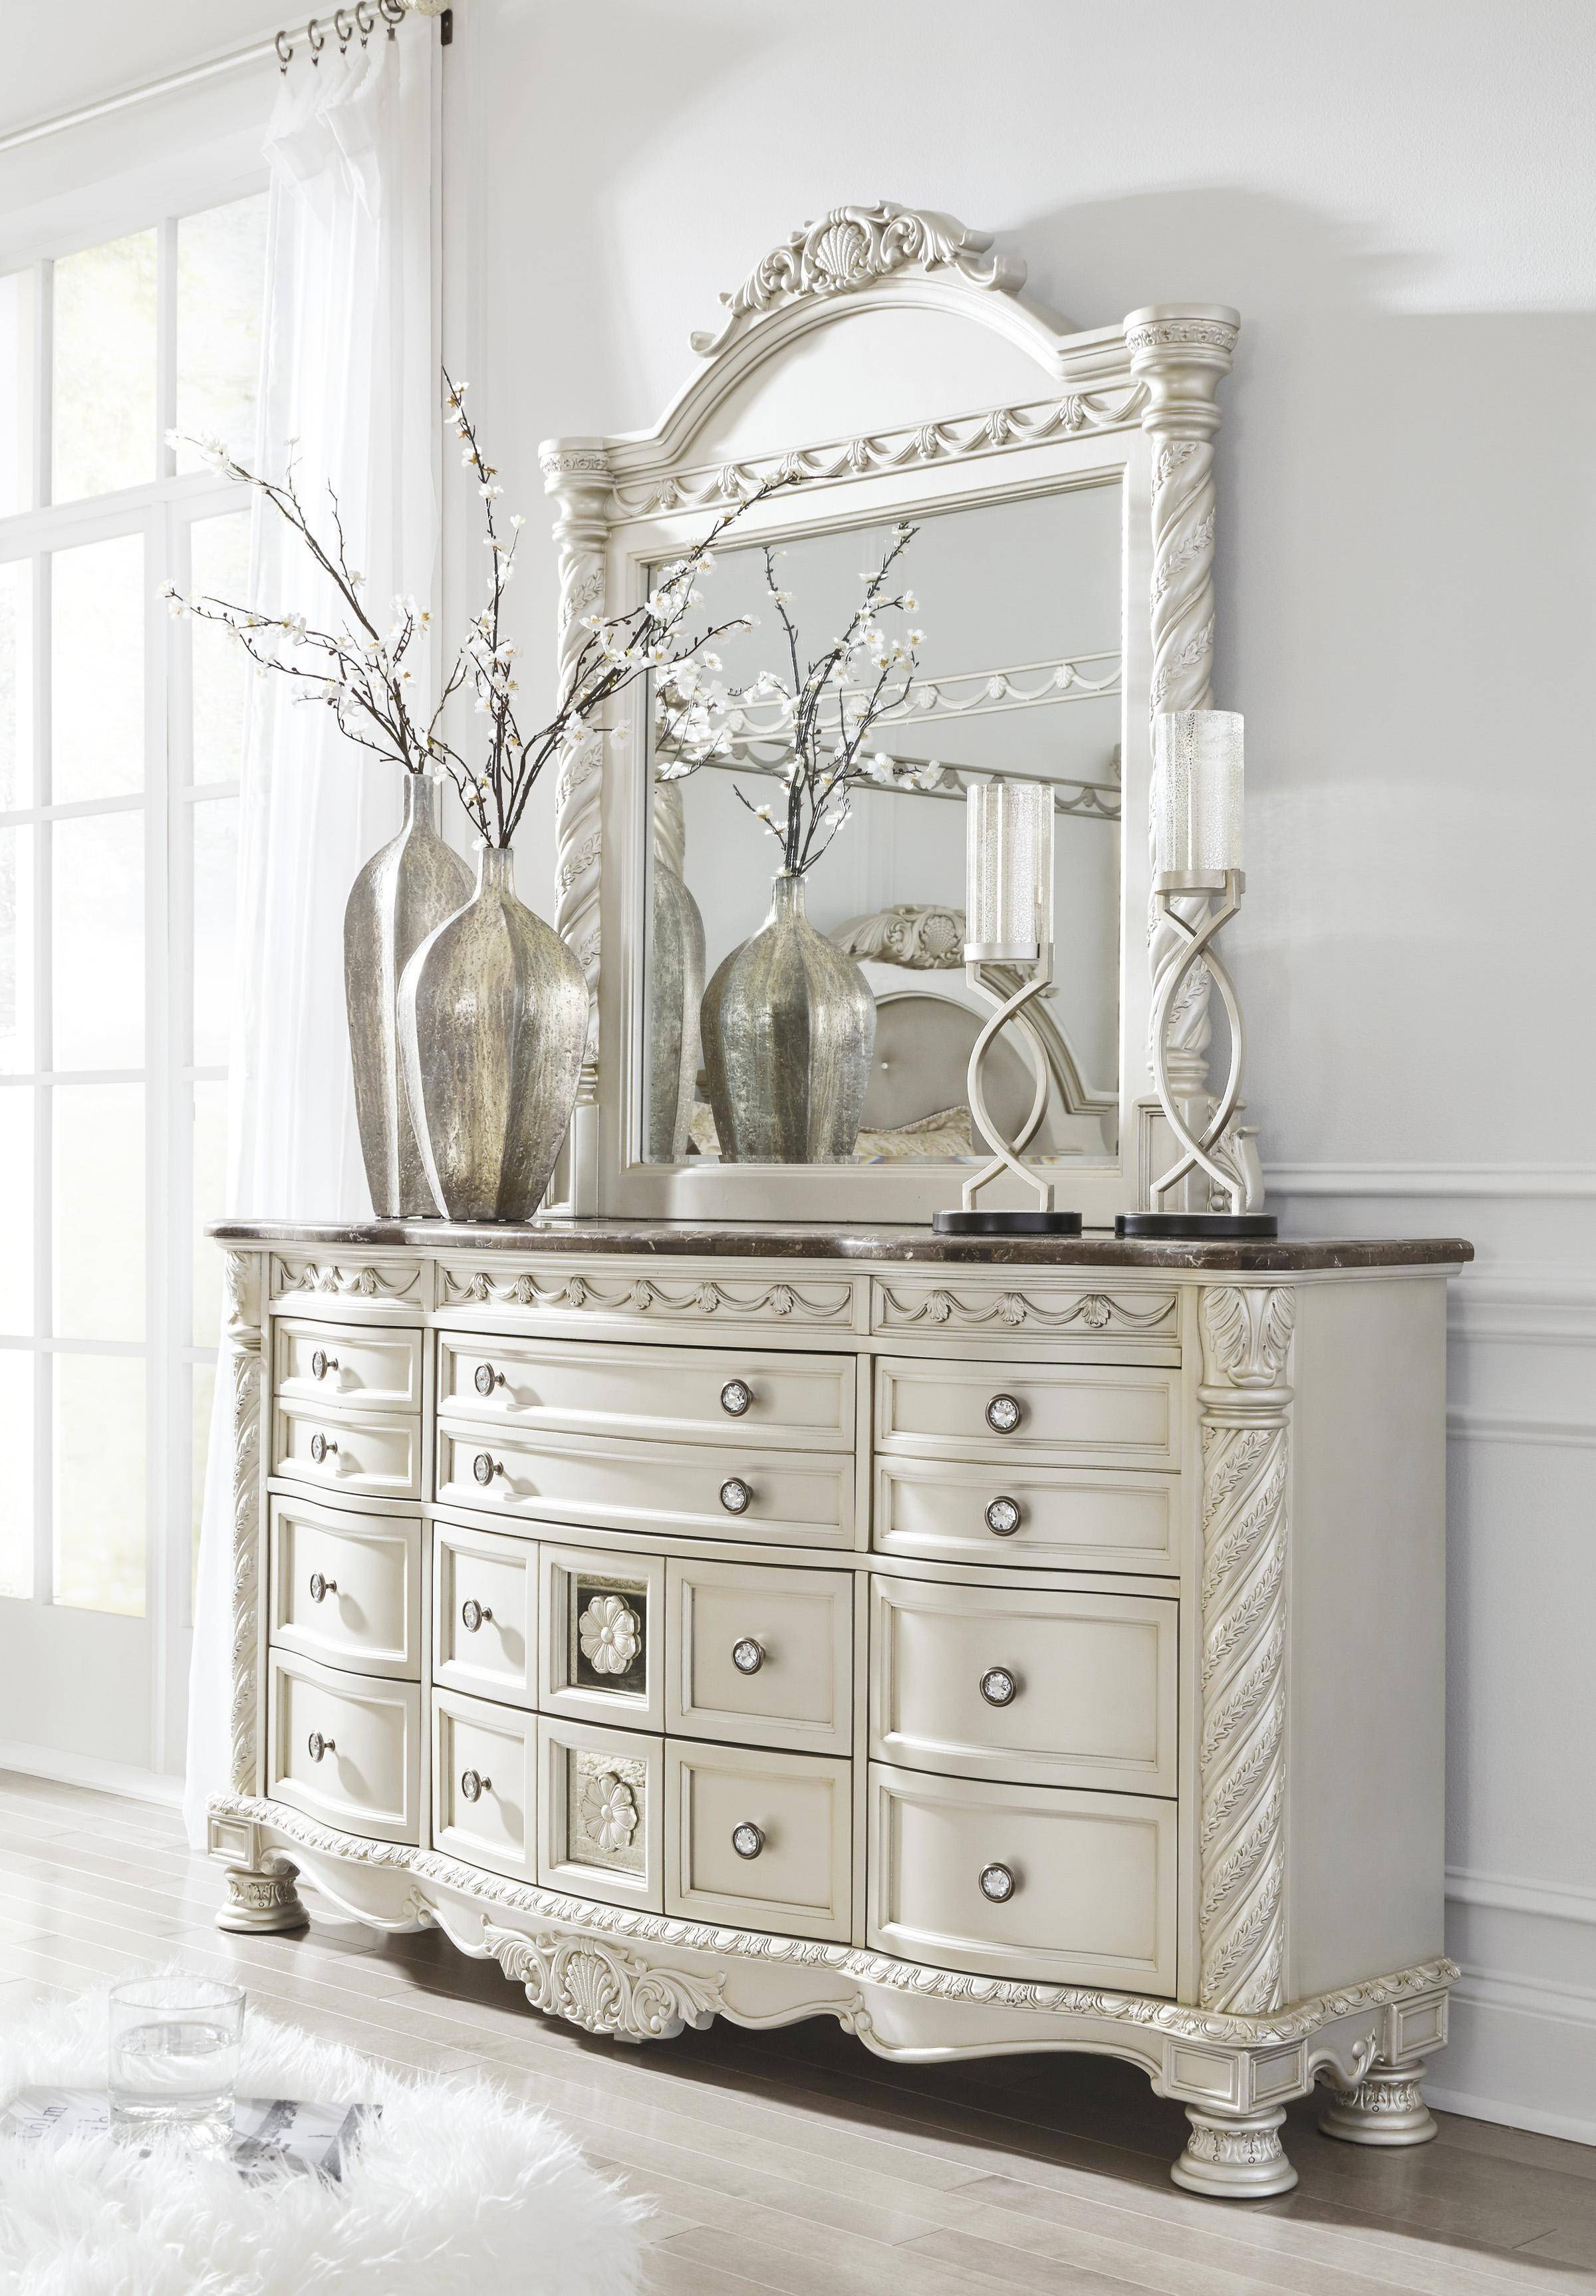 Bedroom Set ashley Furniture Elegant ashley Cassimore B750 Queen Size Sleigh Bedroom Set 5pcs In